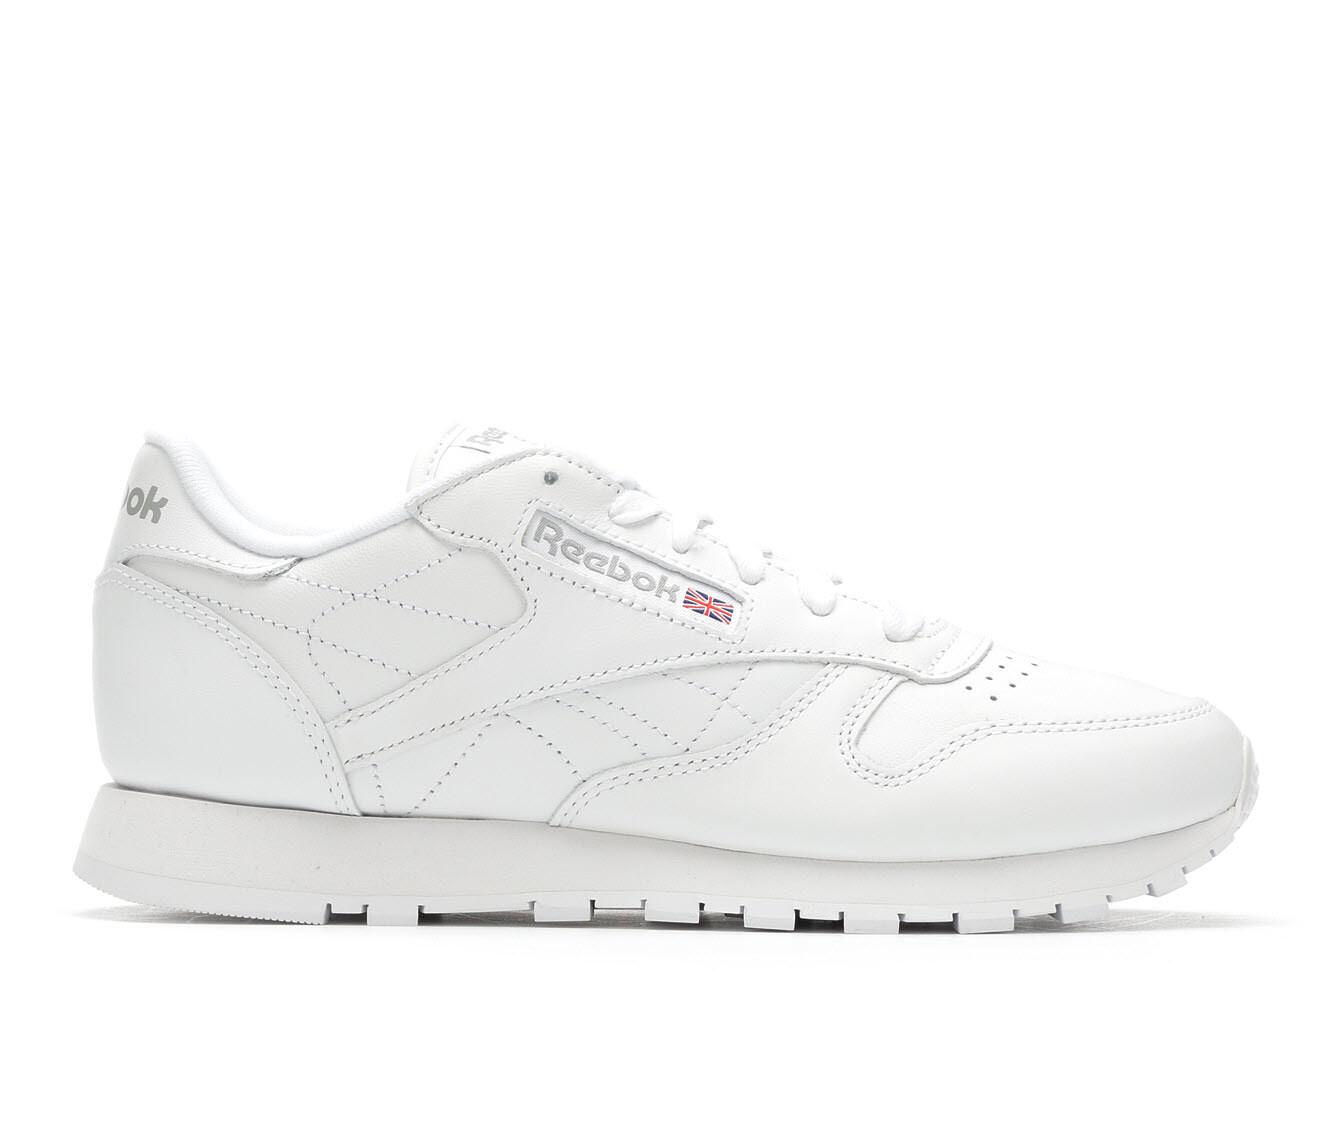 New Style Women's Reebok Classic Leather Jog Retro Sneakers White